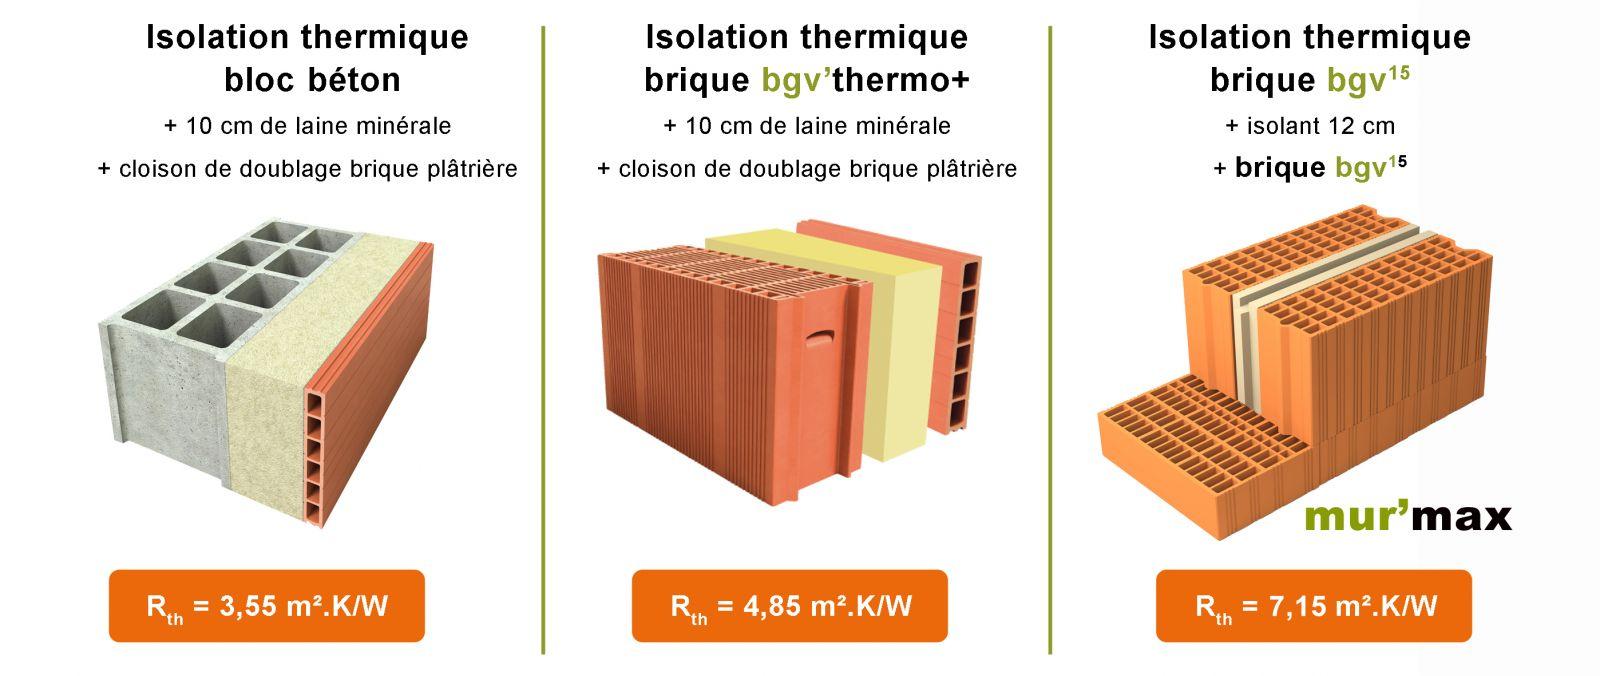 Isolant thermique mur et brique terre cuite bio 39 bric - Isolation mur brique ...